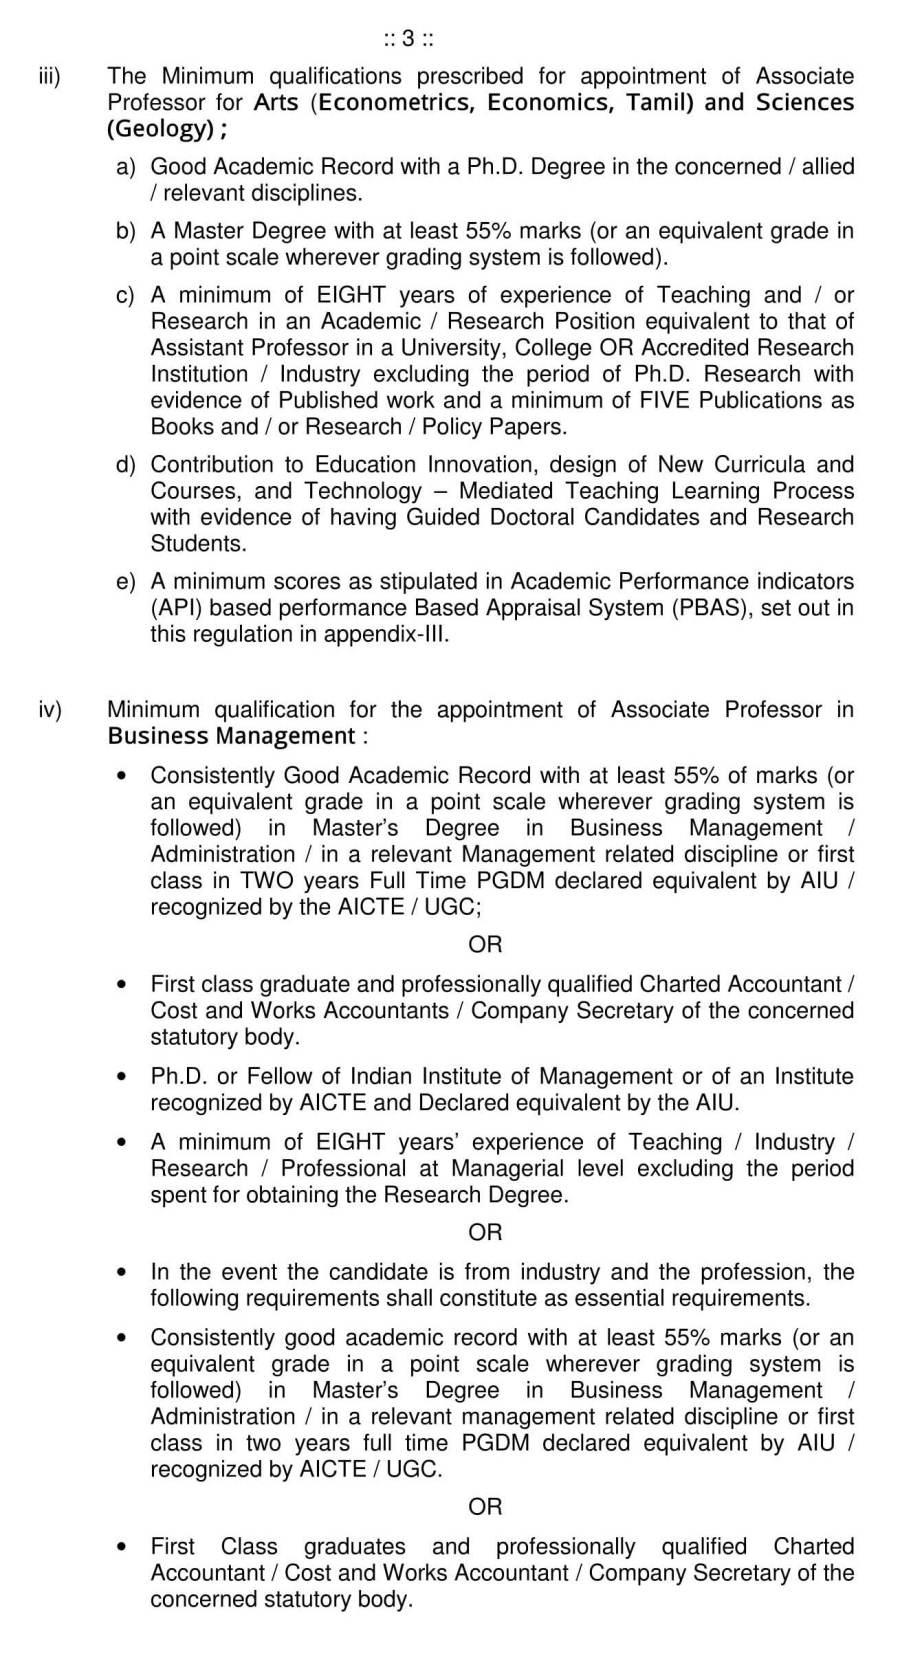 20171224111251515_Notification-for-recruitment-of-Associate-Professor-Posts-2017_3-3.jpg